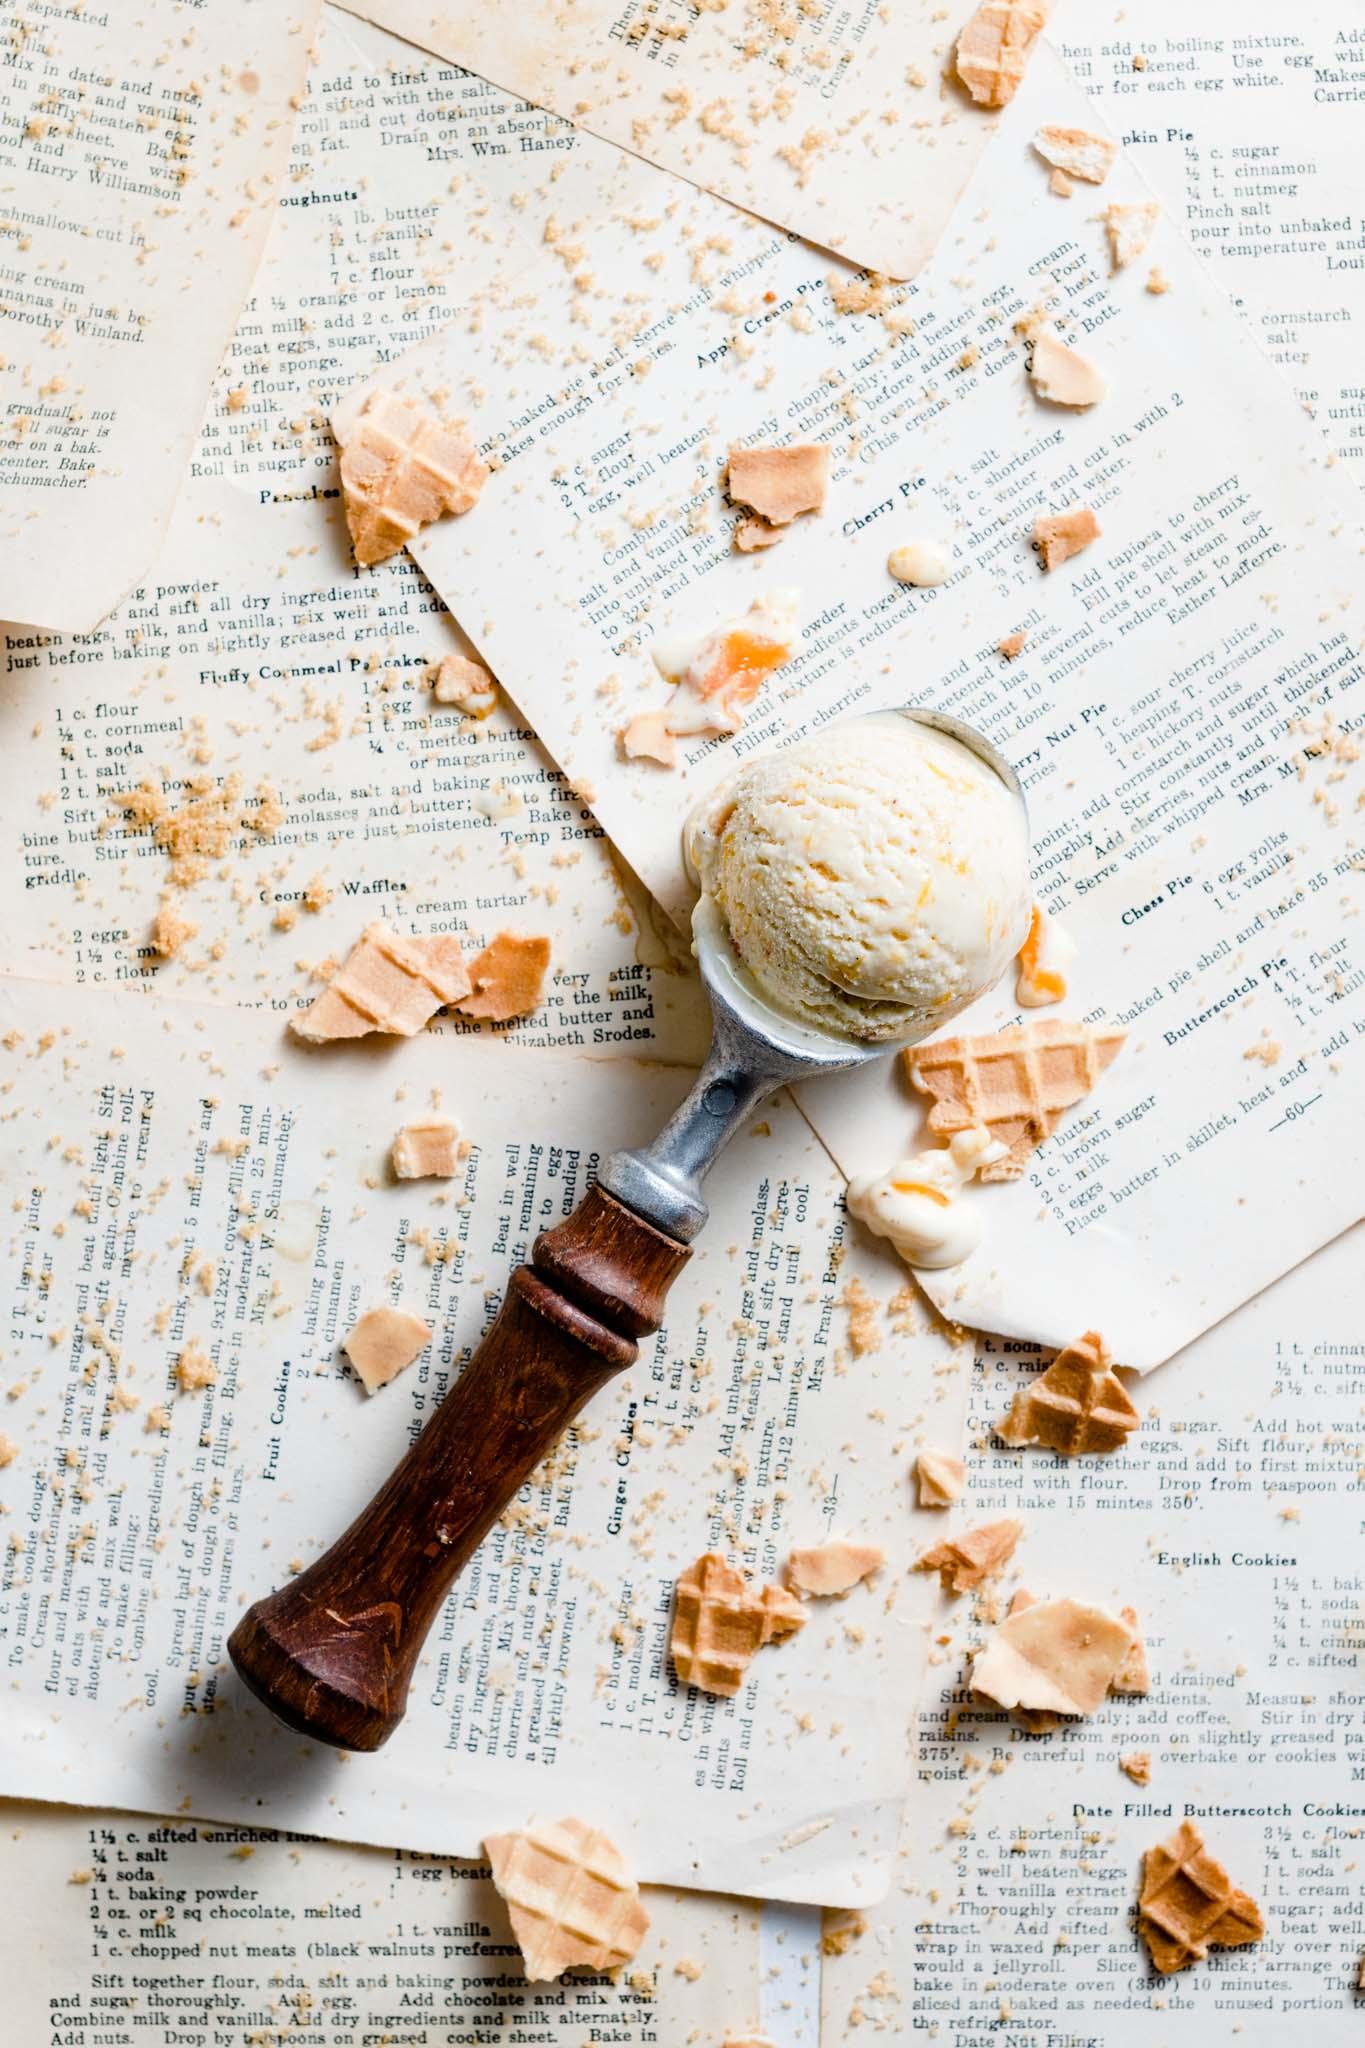 Ice cream scoop with peach ice cream.